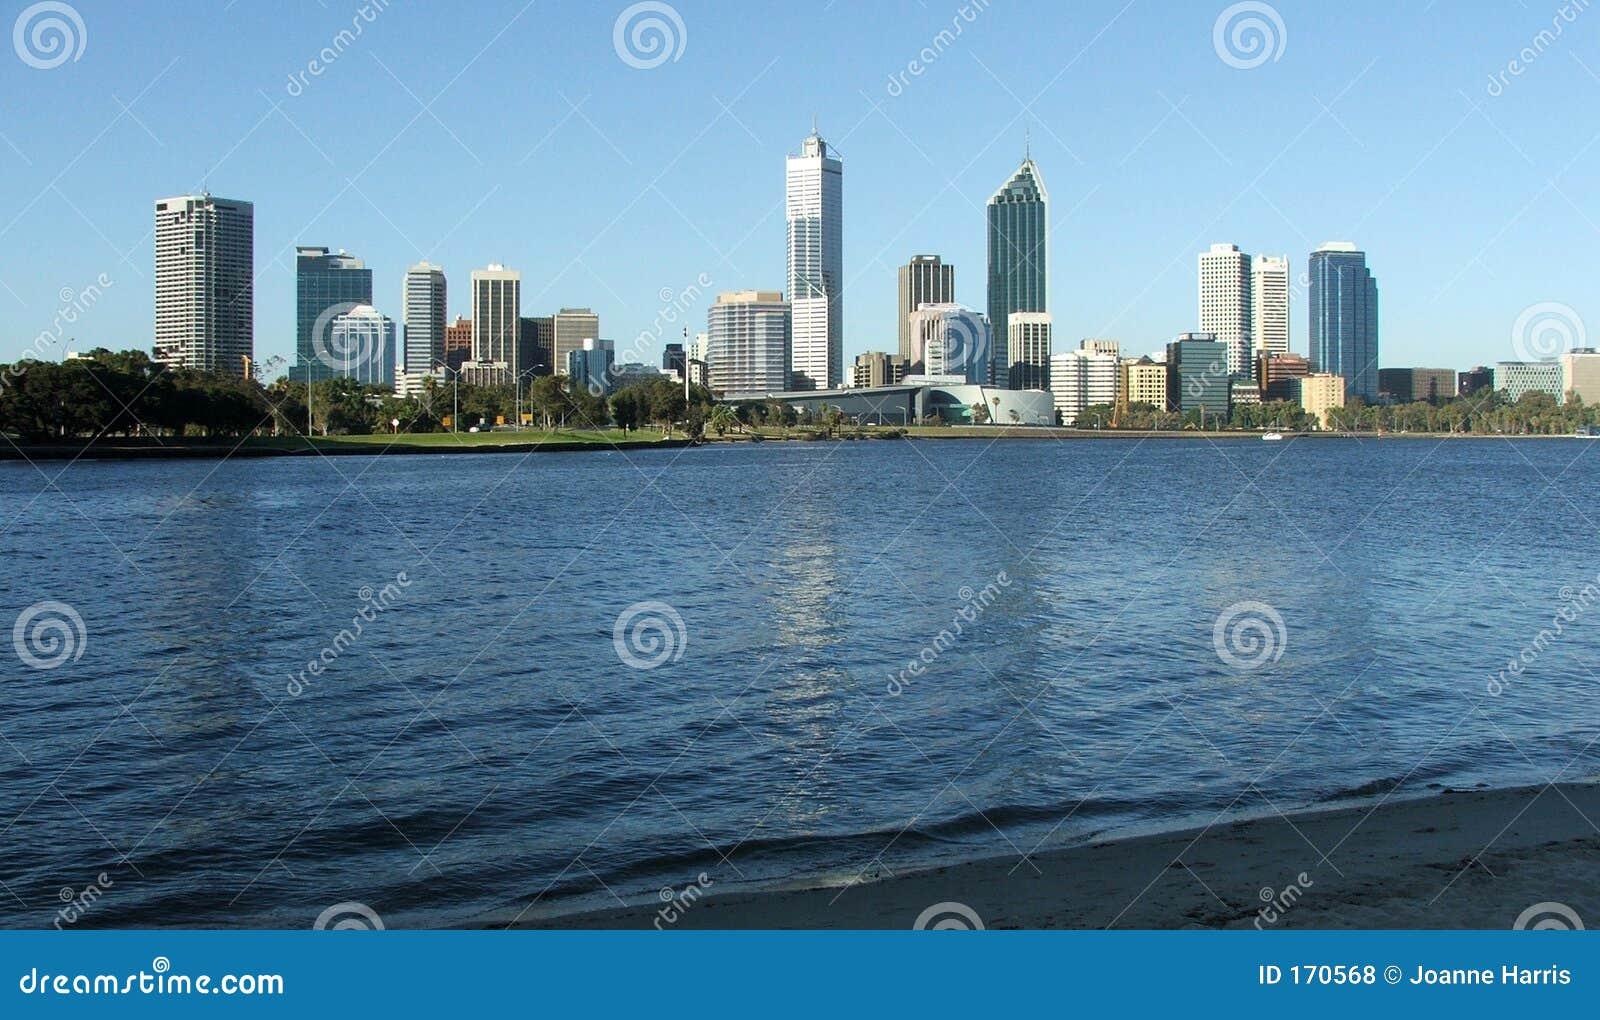 City-Perth Day